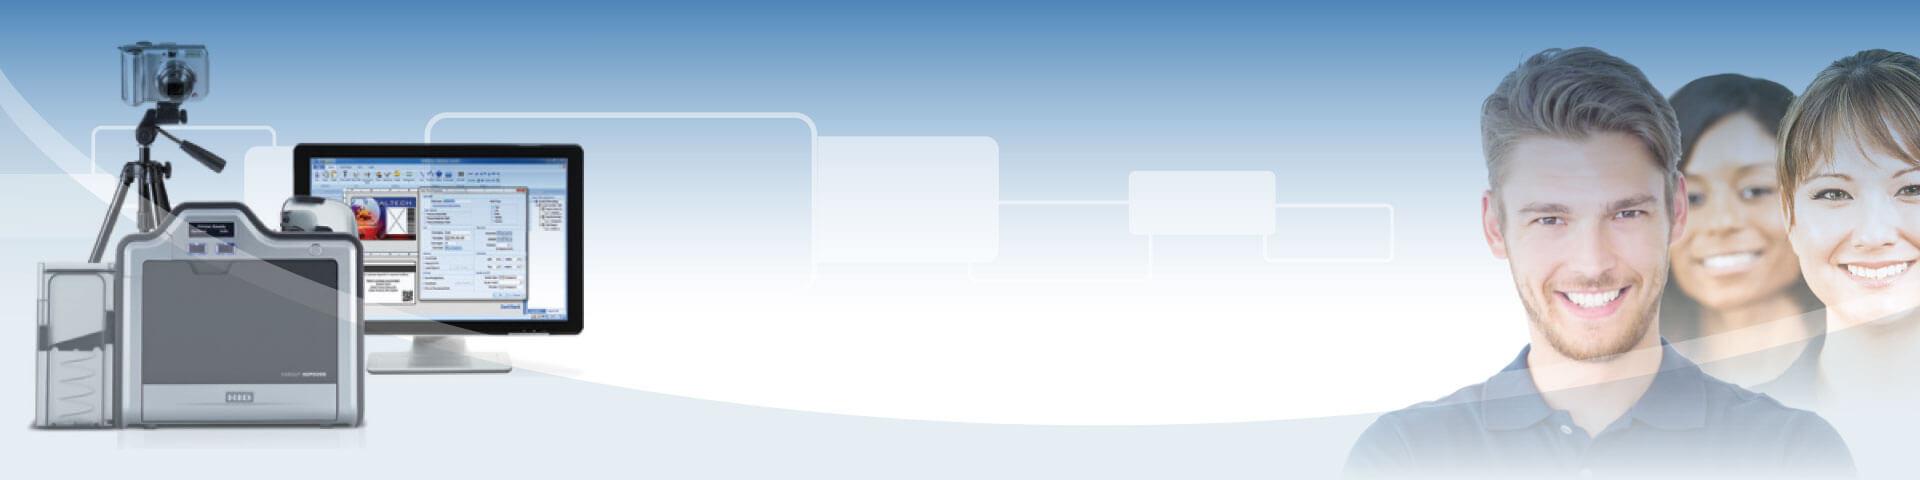 AsureID-ID-Card-Printer-Software-1920x480